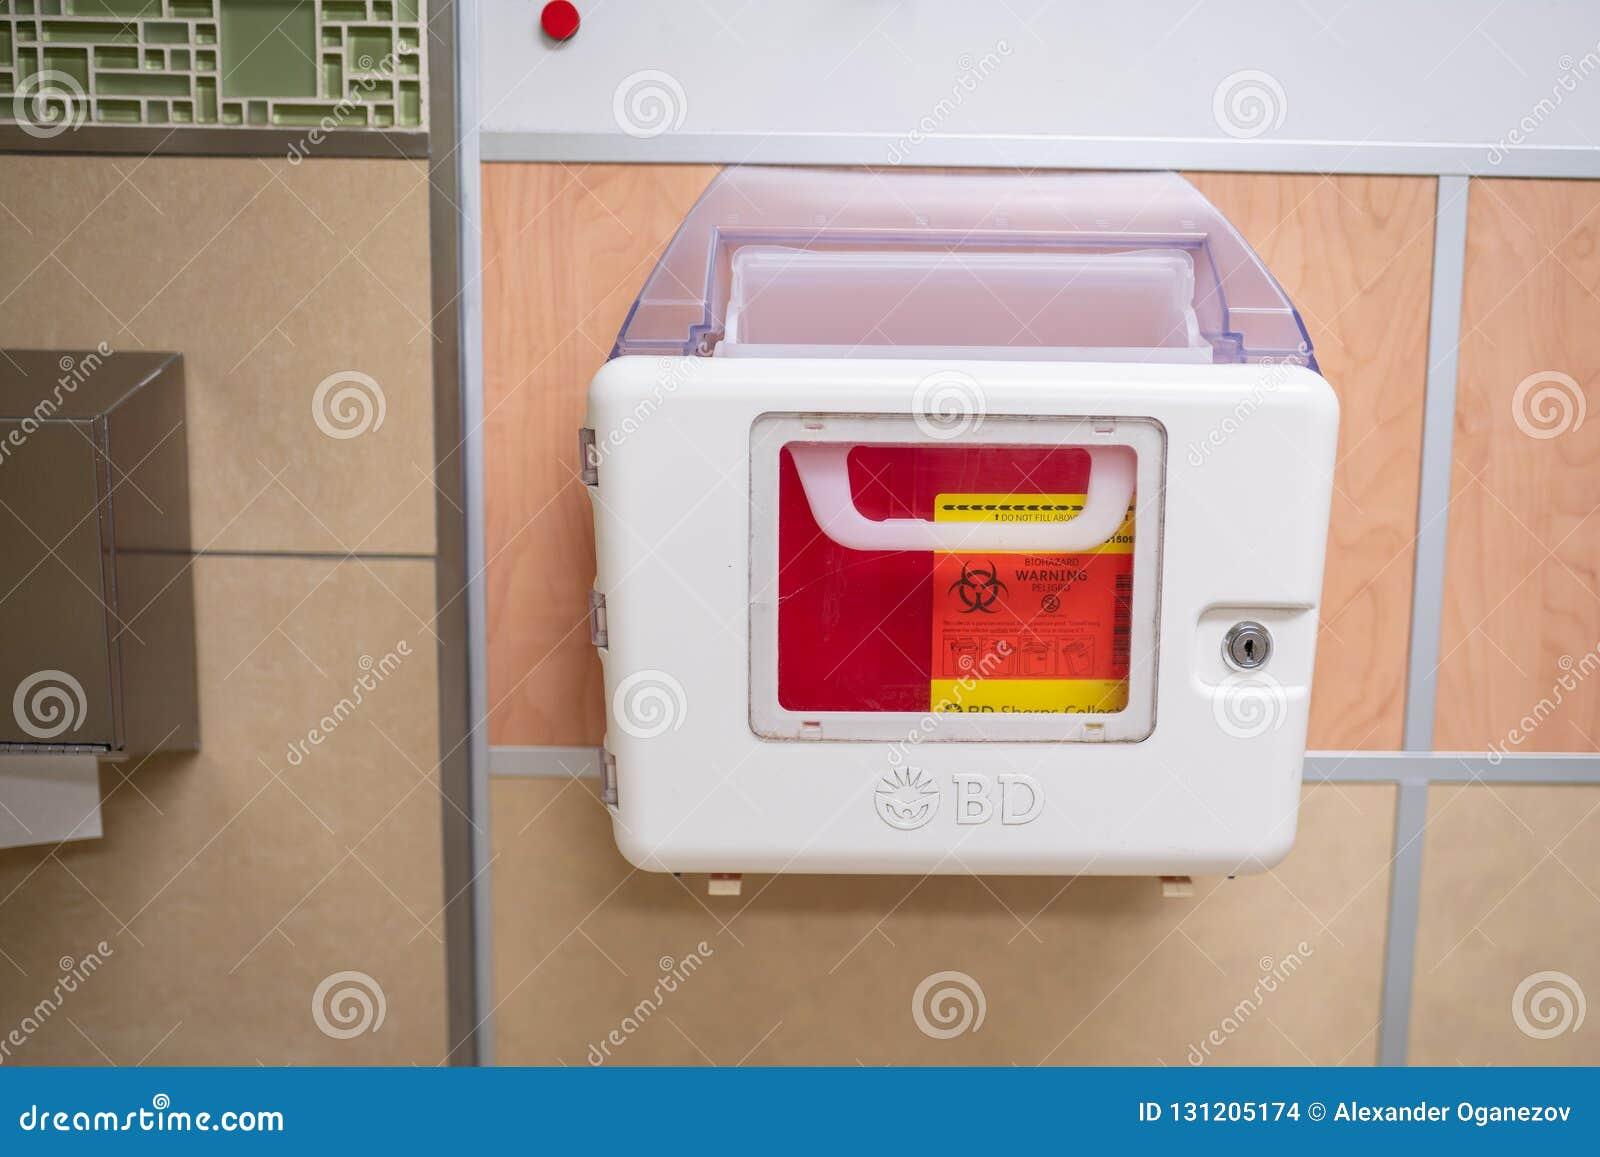 BD Recykleen Medical box for disposal of needles.